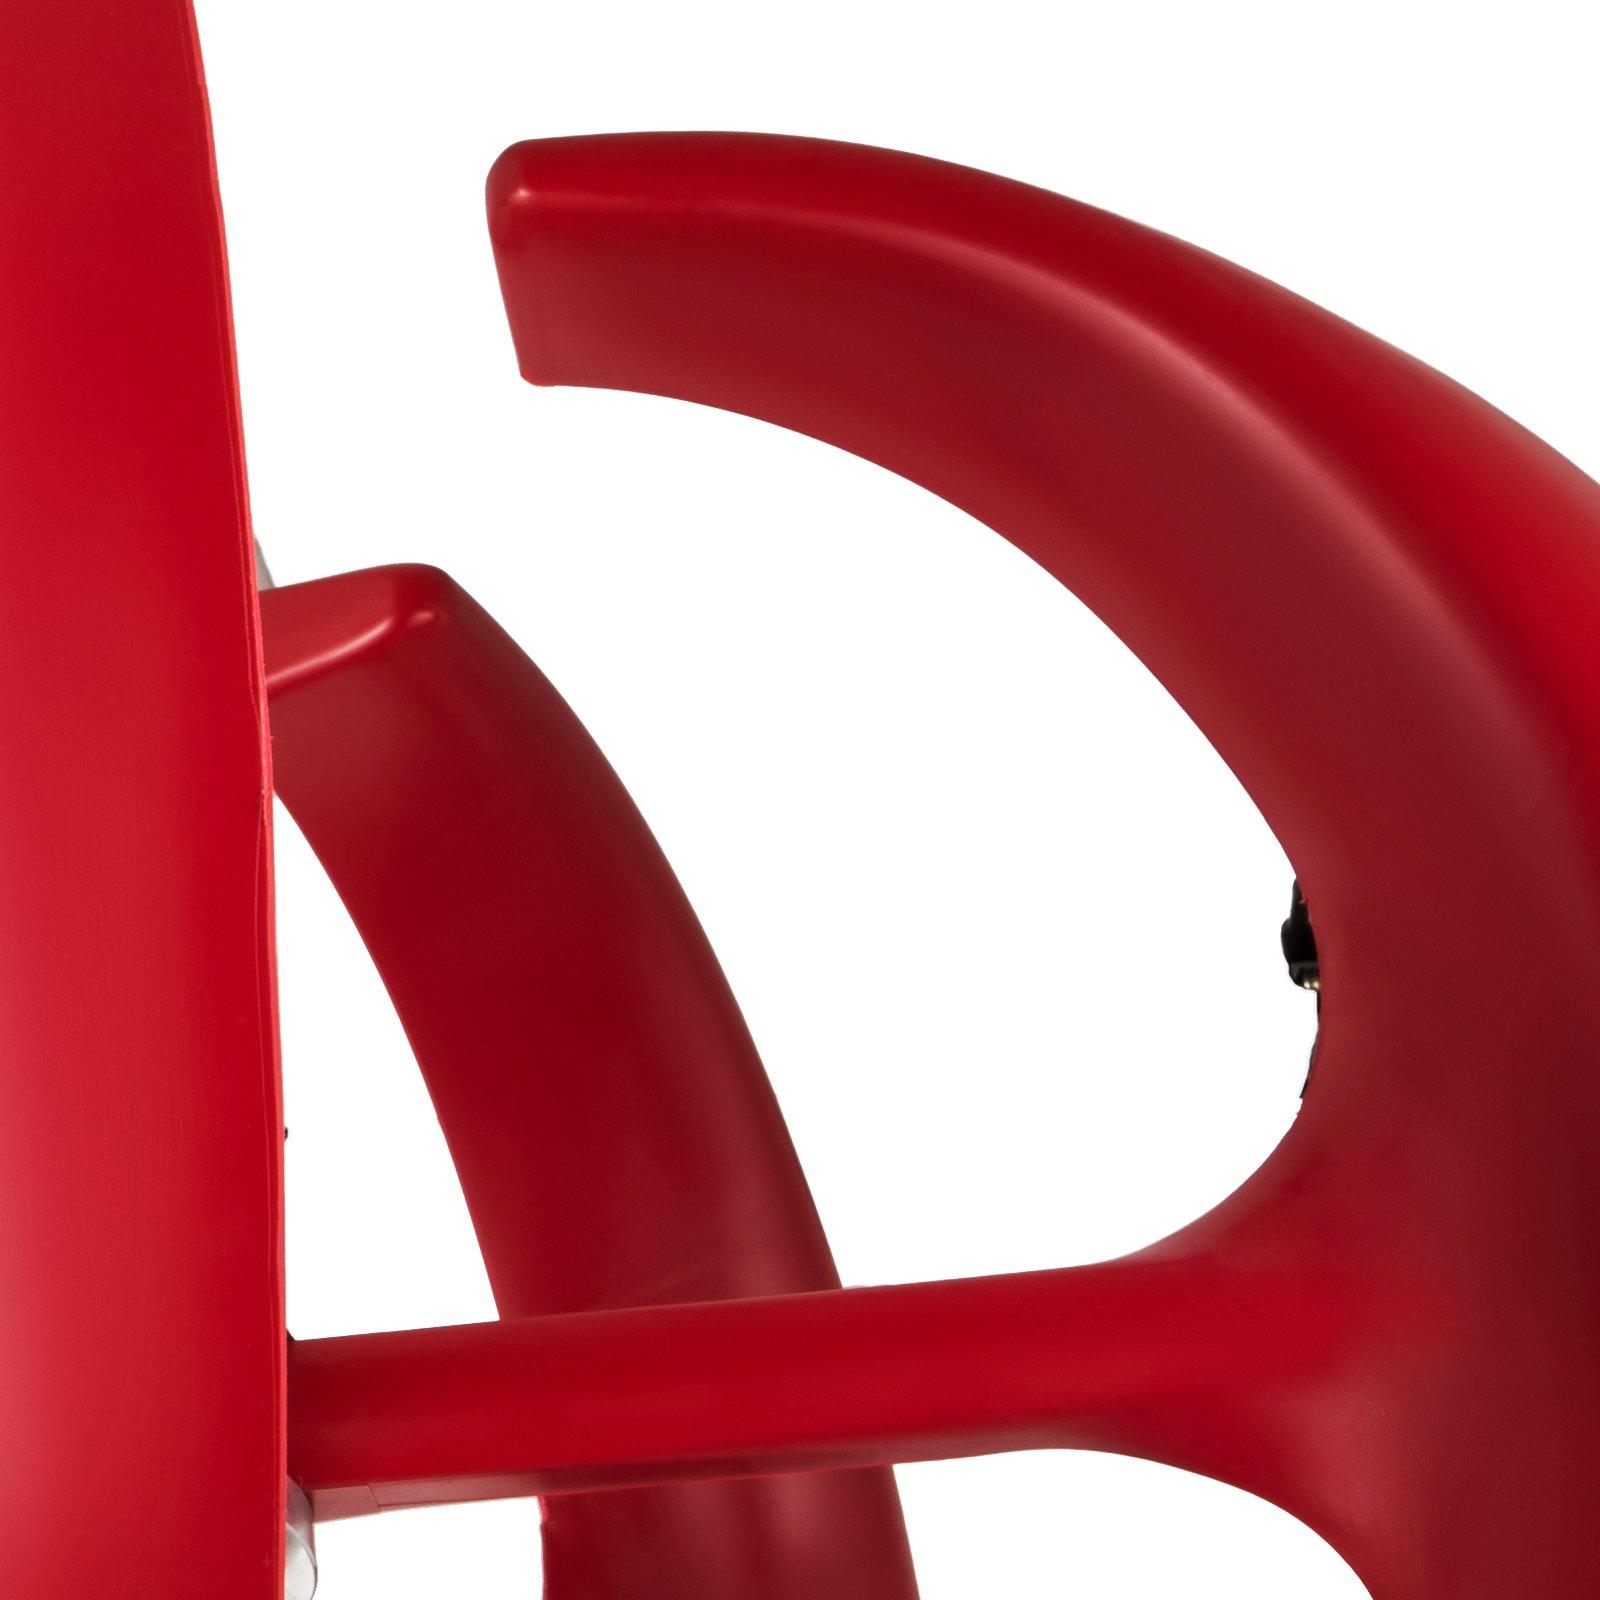 Happybuy Wind Turbine 300W 12V Wind Turbine Generator Red Lantern Vertical Wind Generator 5 Leaves Wind Turbine Kit with Controller No Pole (300W 12V, Red) by Happybuy (Image #7)